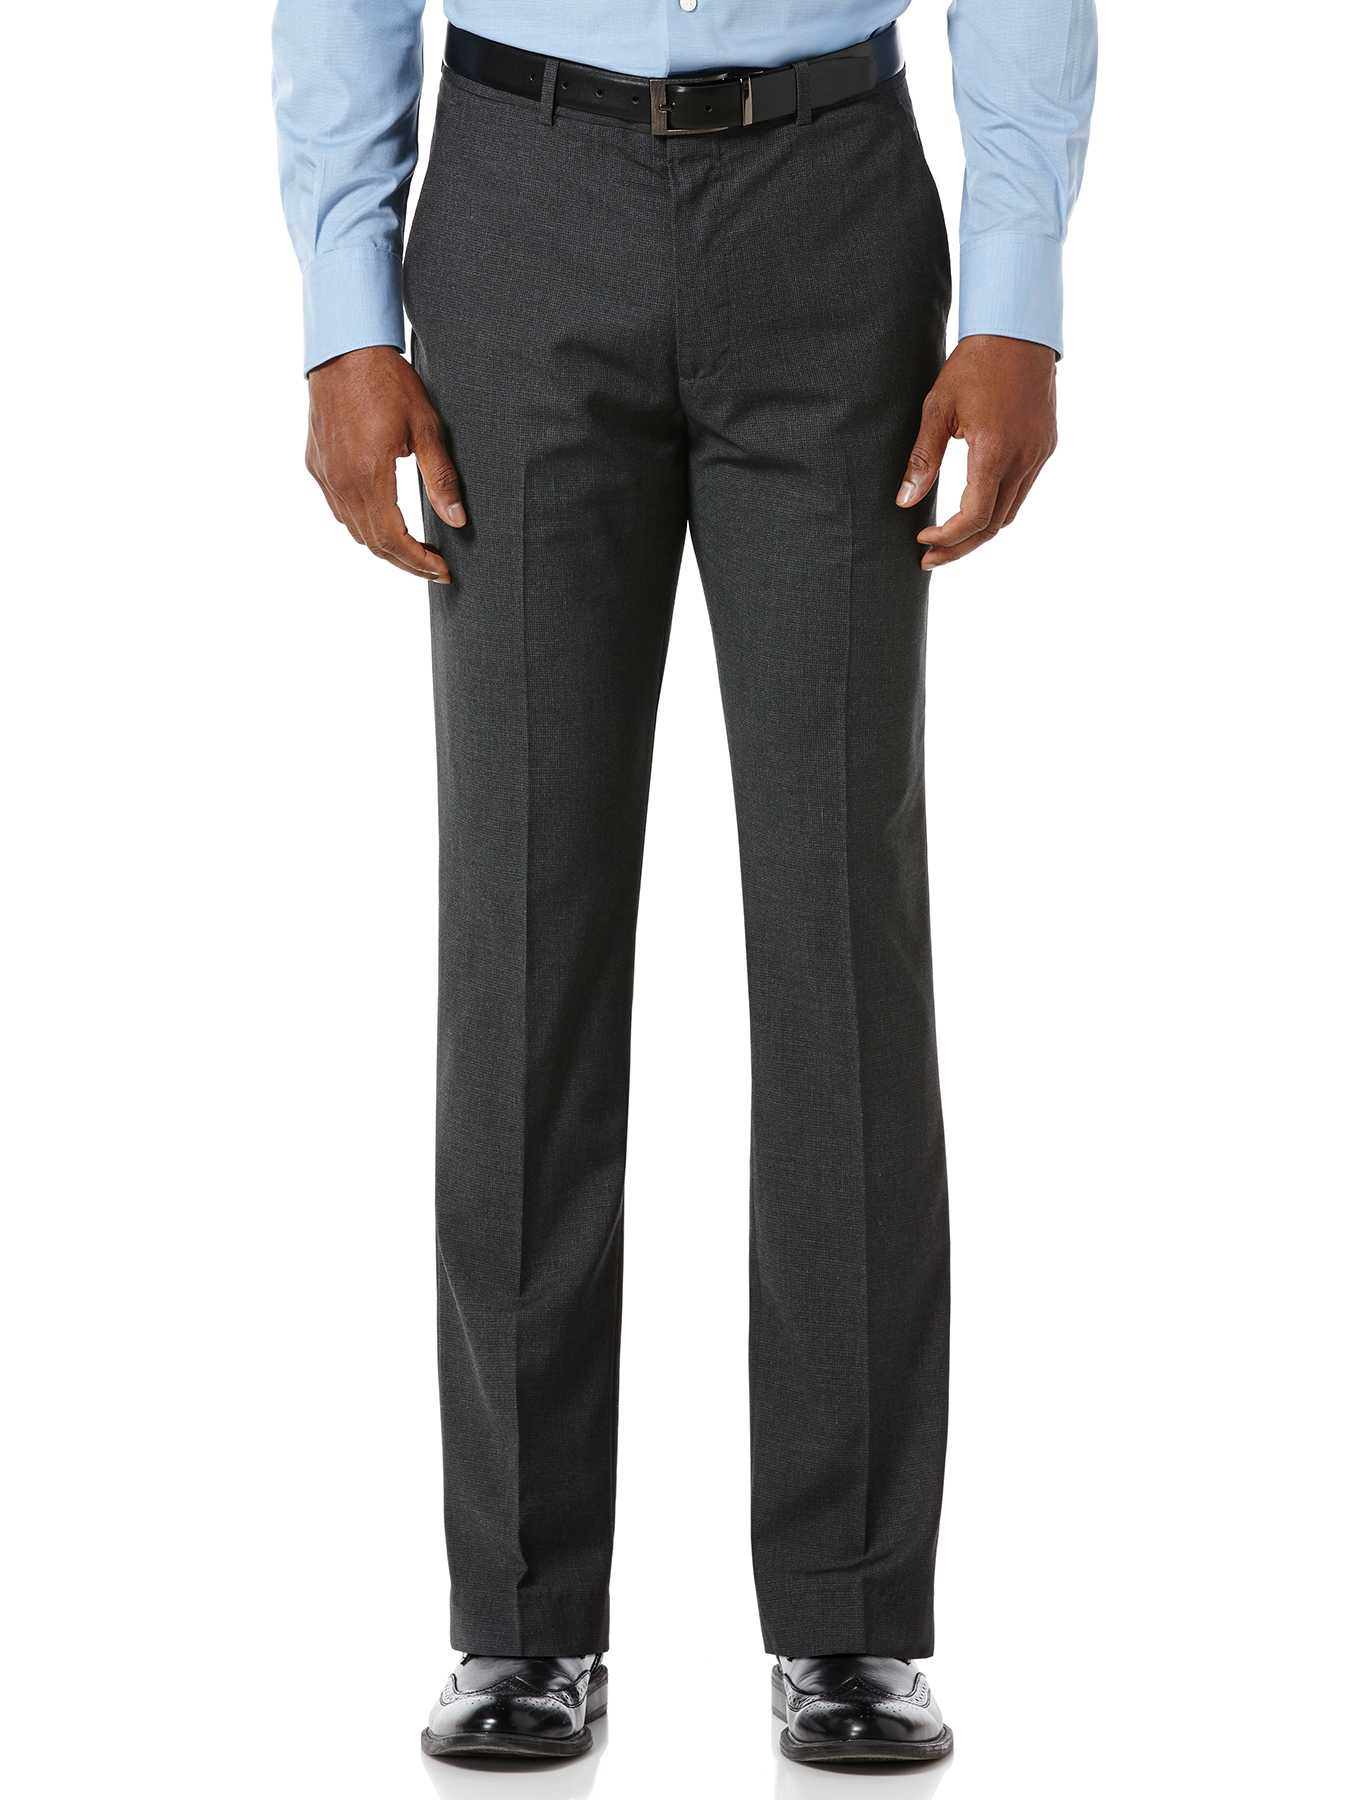 Perry Ellis Slim Fit Neat Dress Pant